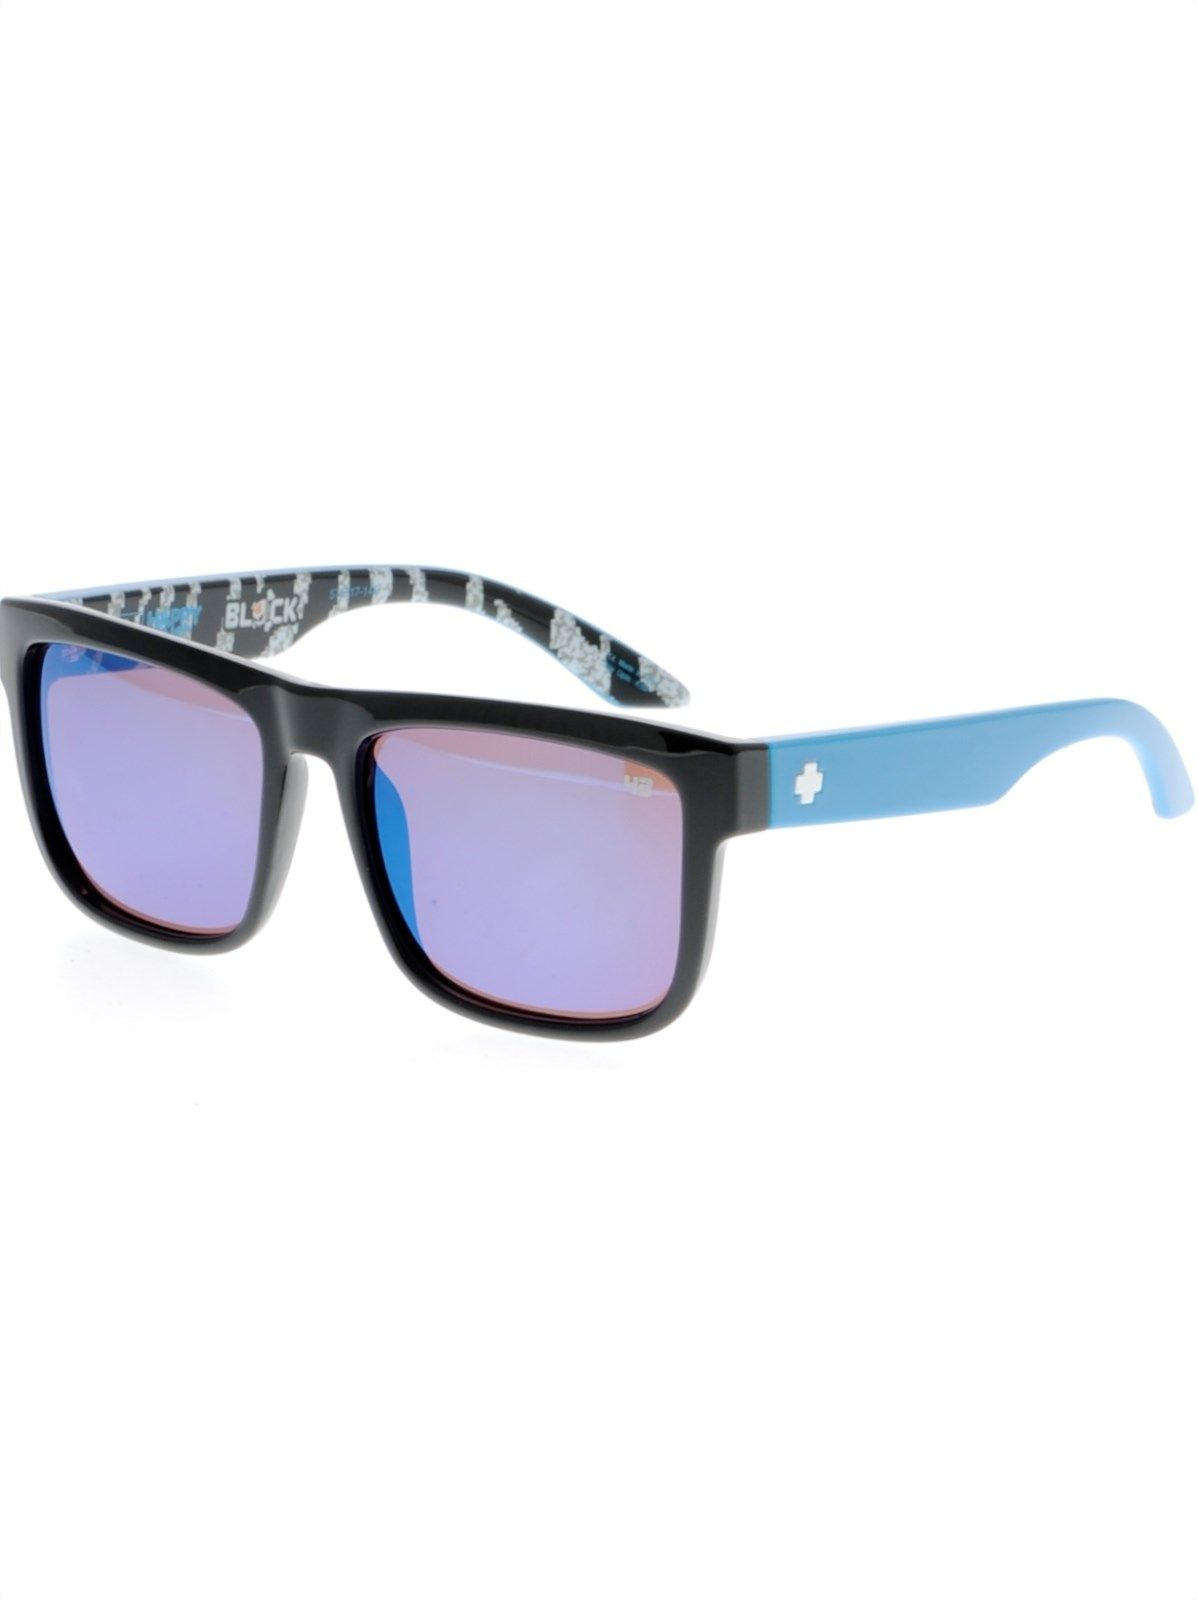 9ec9449de2f Spy Livery Black-Happy Bronze-Dark Blue Spectra Ken Block Discord Sunglasses